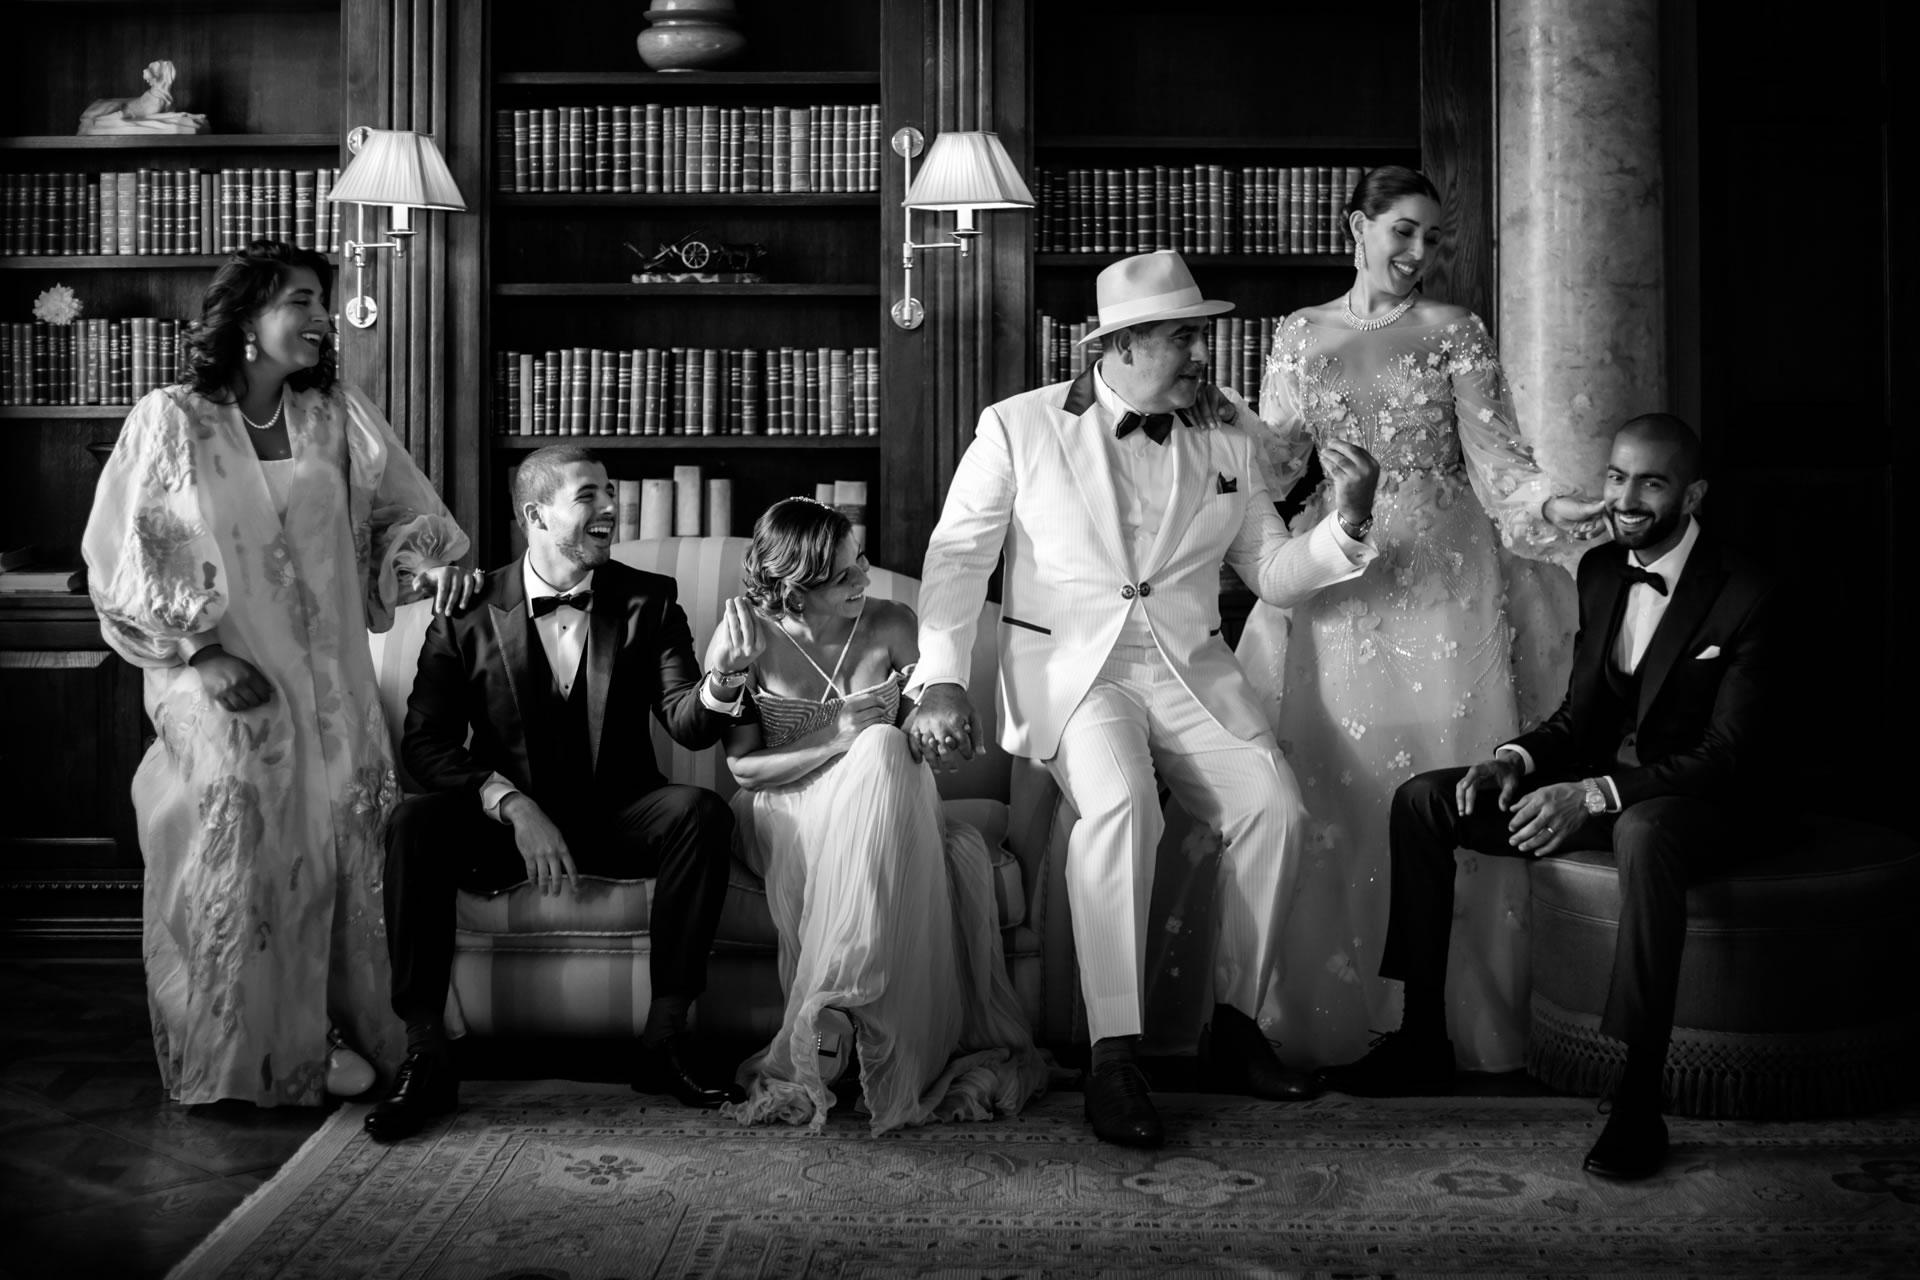 Family - 12 :: Luxury wedding at Il Borro :: Luxury wedding photography - 11 :: Family - 12